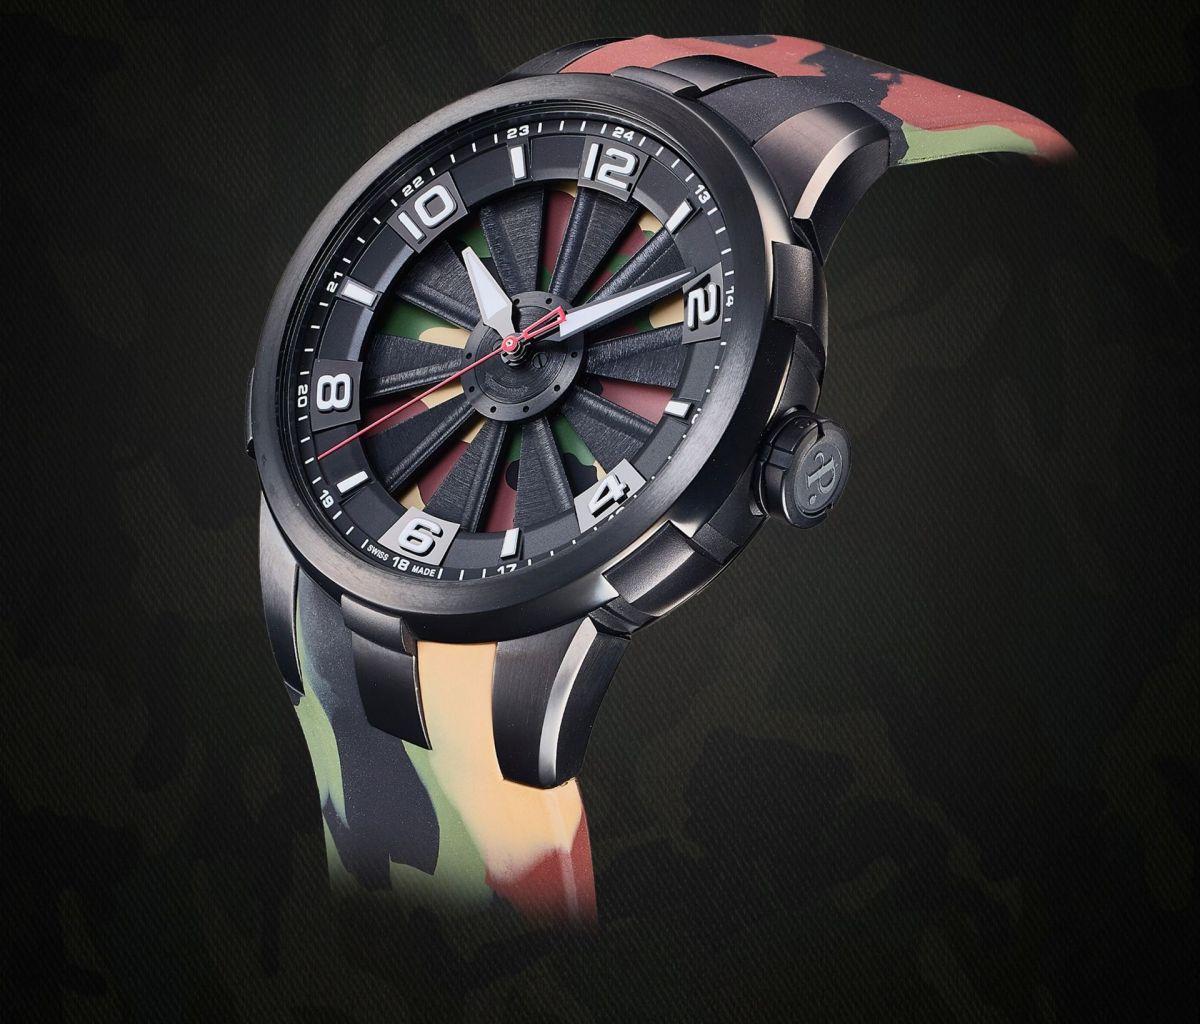 Perrelet Turbine Camo Limited Edition 4